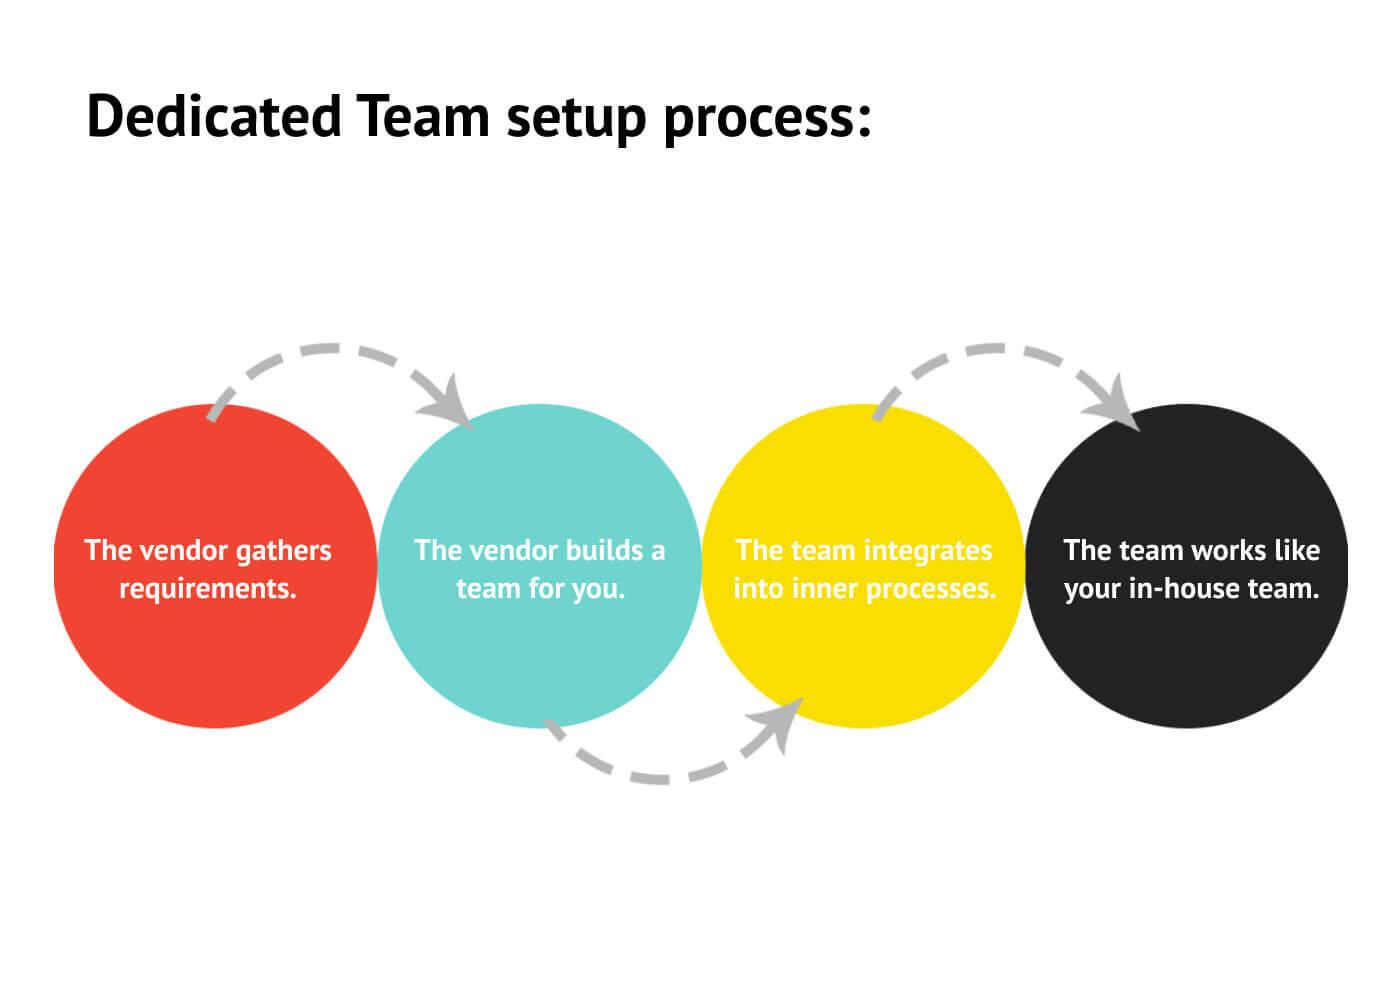 Dedicated Team setup process.